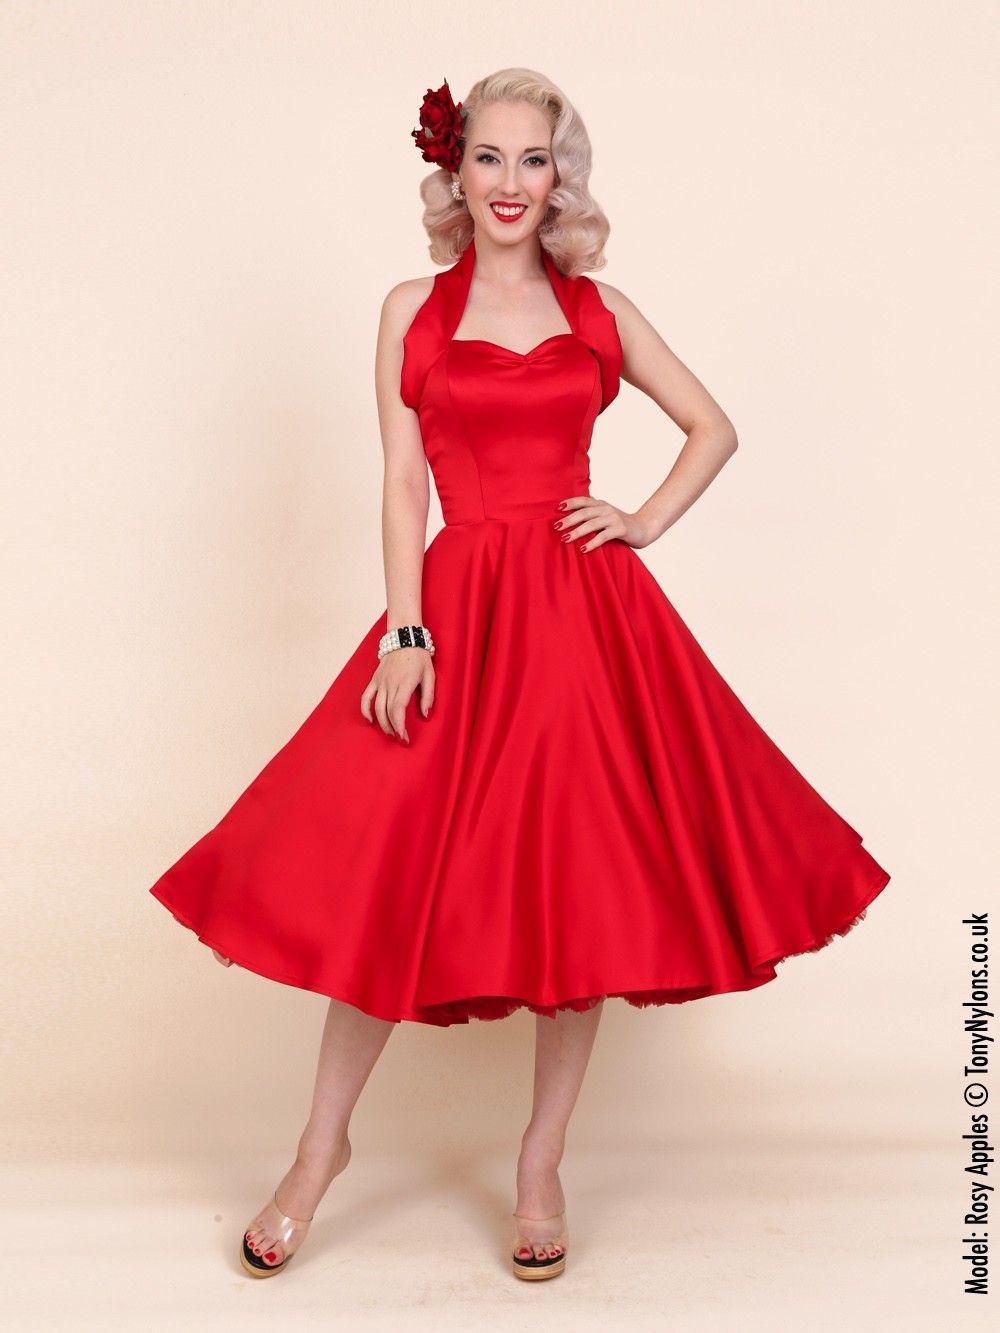 1950s Halterneck Red Duchess Dress - Alicia&-39-s Fashion era favorite ...